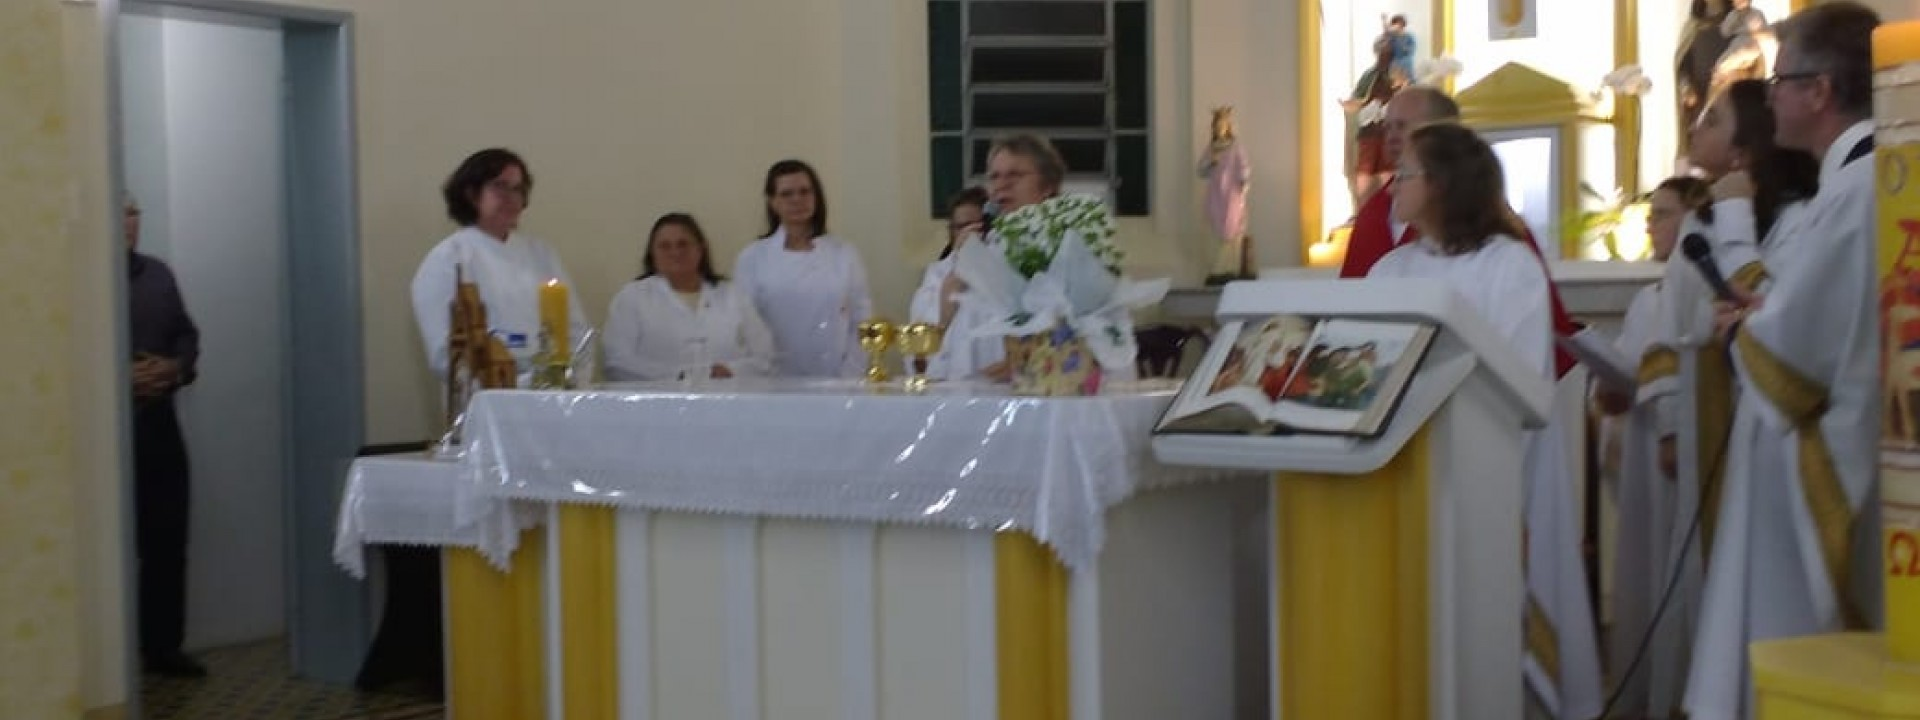 comunidade-do-bairro-alfandega-celebra-a-chegada-do-cristo-ressuscitado_10_870.jpg